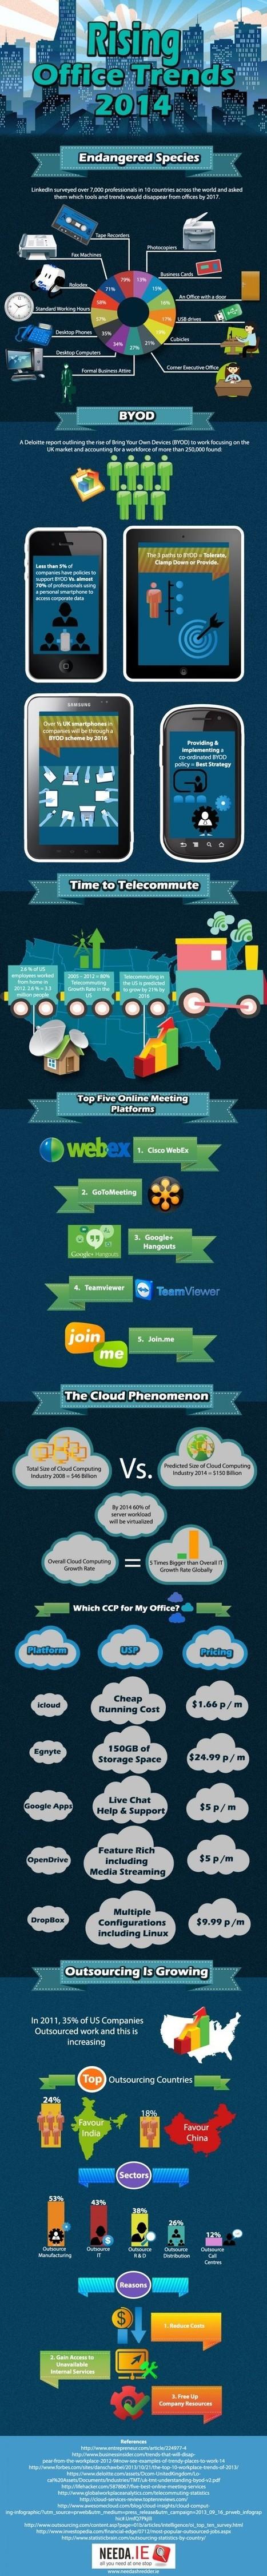 Rising Office Trends - SiteProNews   Digital-News on Scoop.it today   Scoop.it